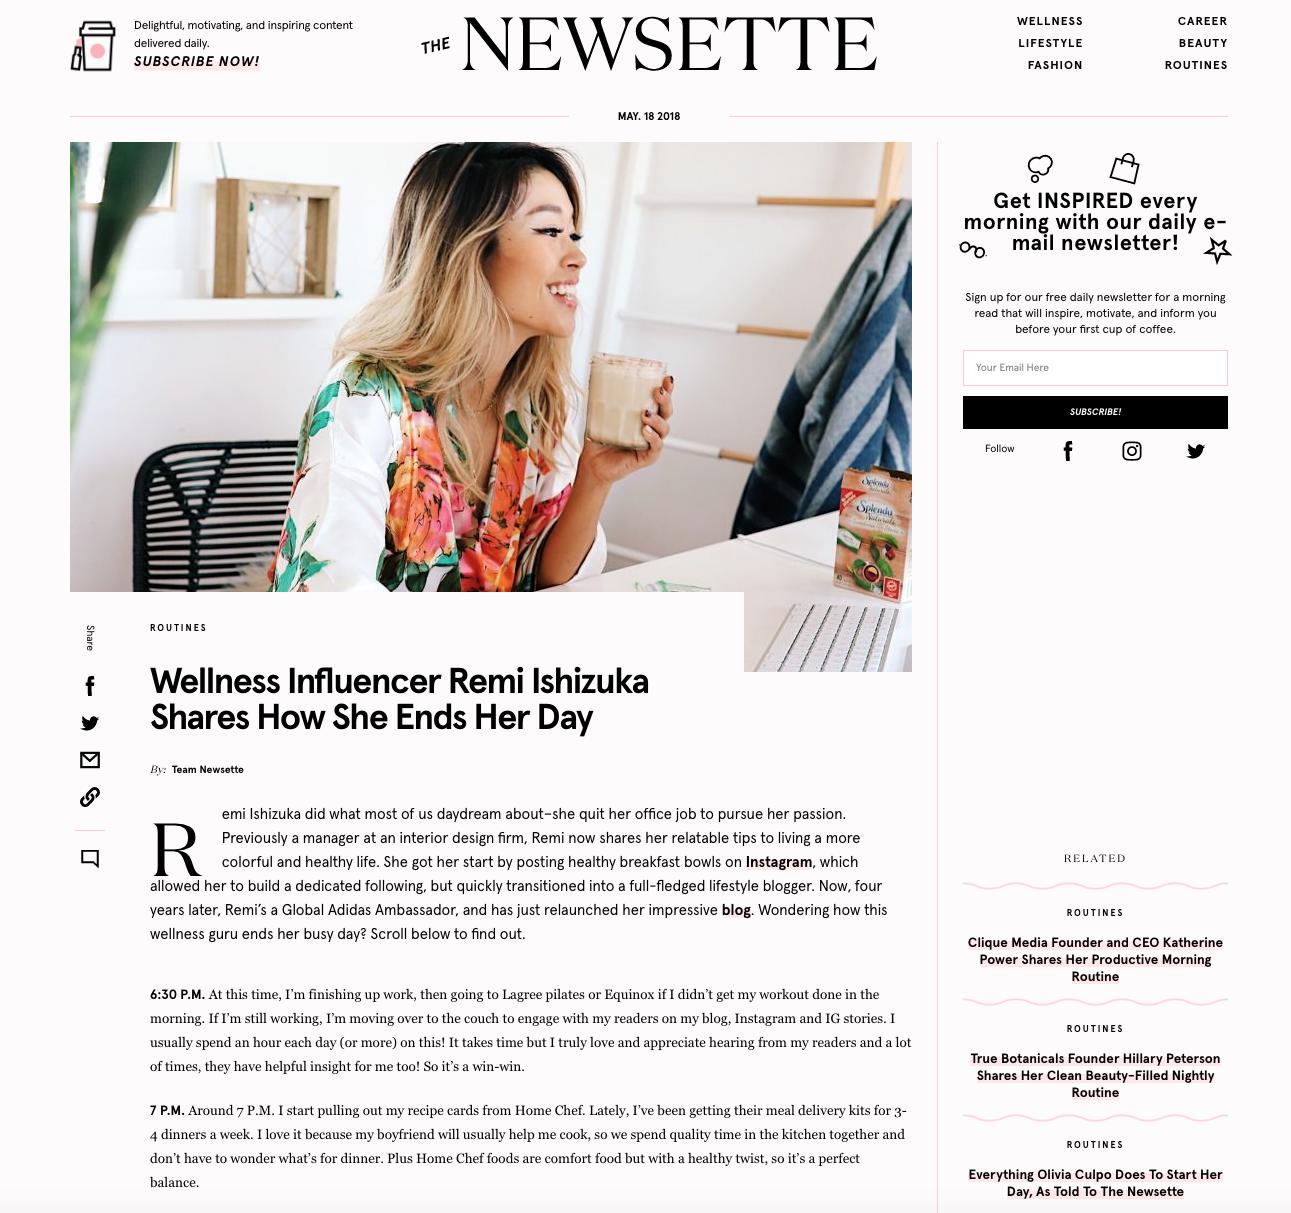 """WELLNESS INFLUENCER REMI ISHIZUKA SHARES HOW SHE ENDS HER DAY""    THENEWSETTE.COM"